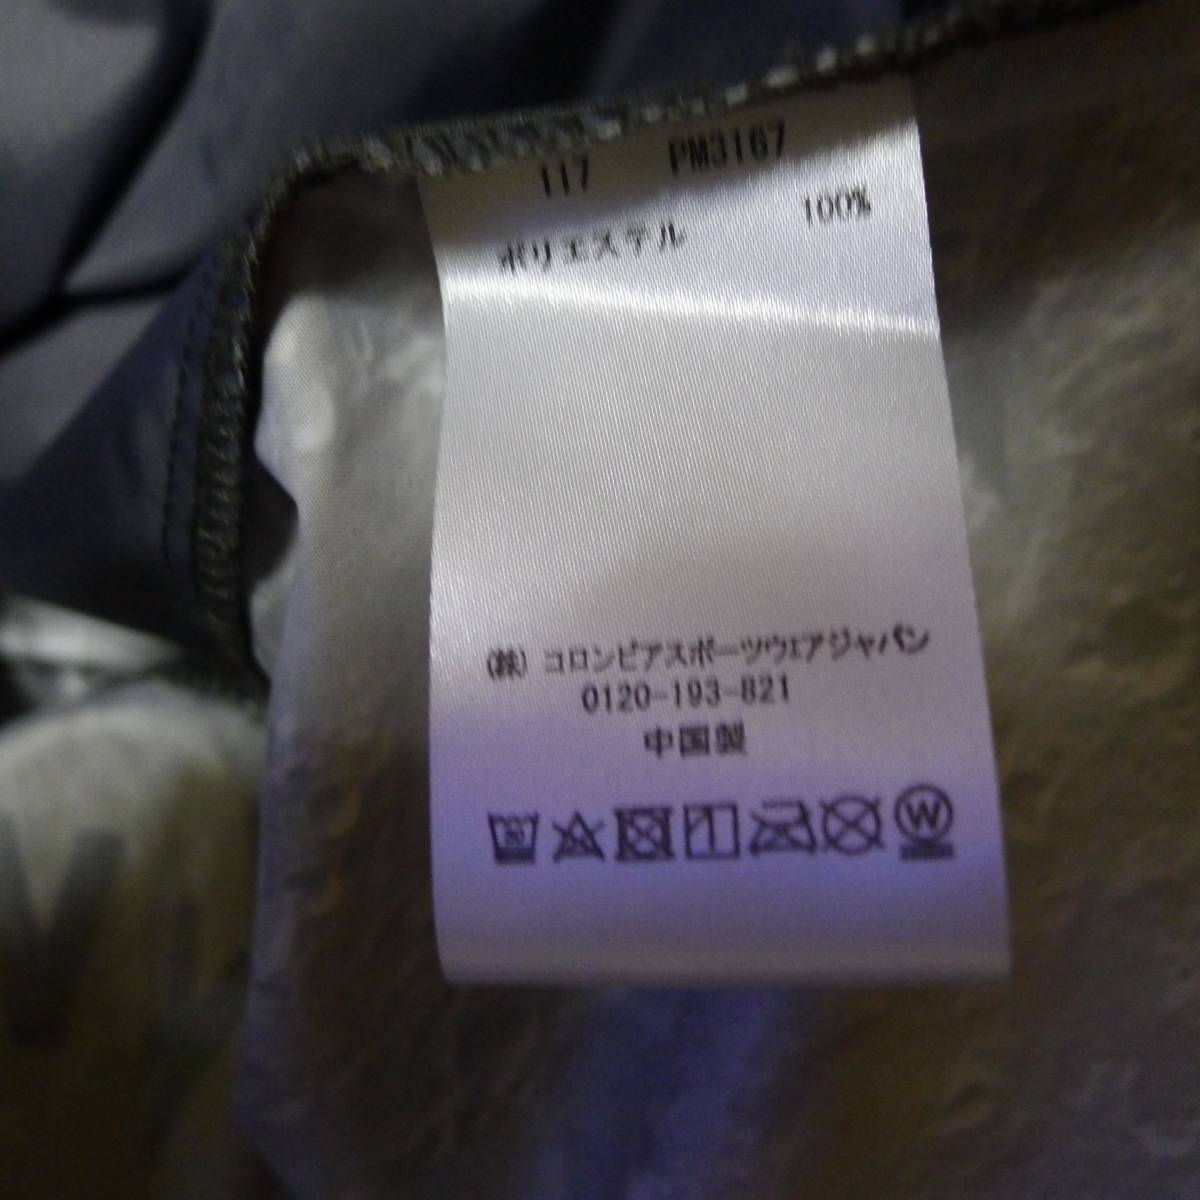 Kinetics × Columbia Tyger SweepTM Jacket タイガースウィープジャケット 月面柄 キネティックス コラボ_画像7